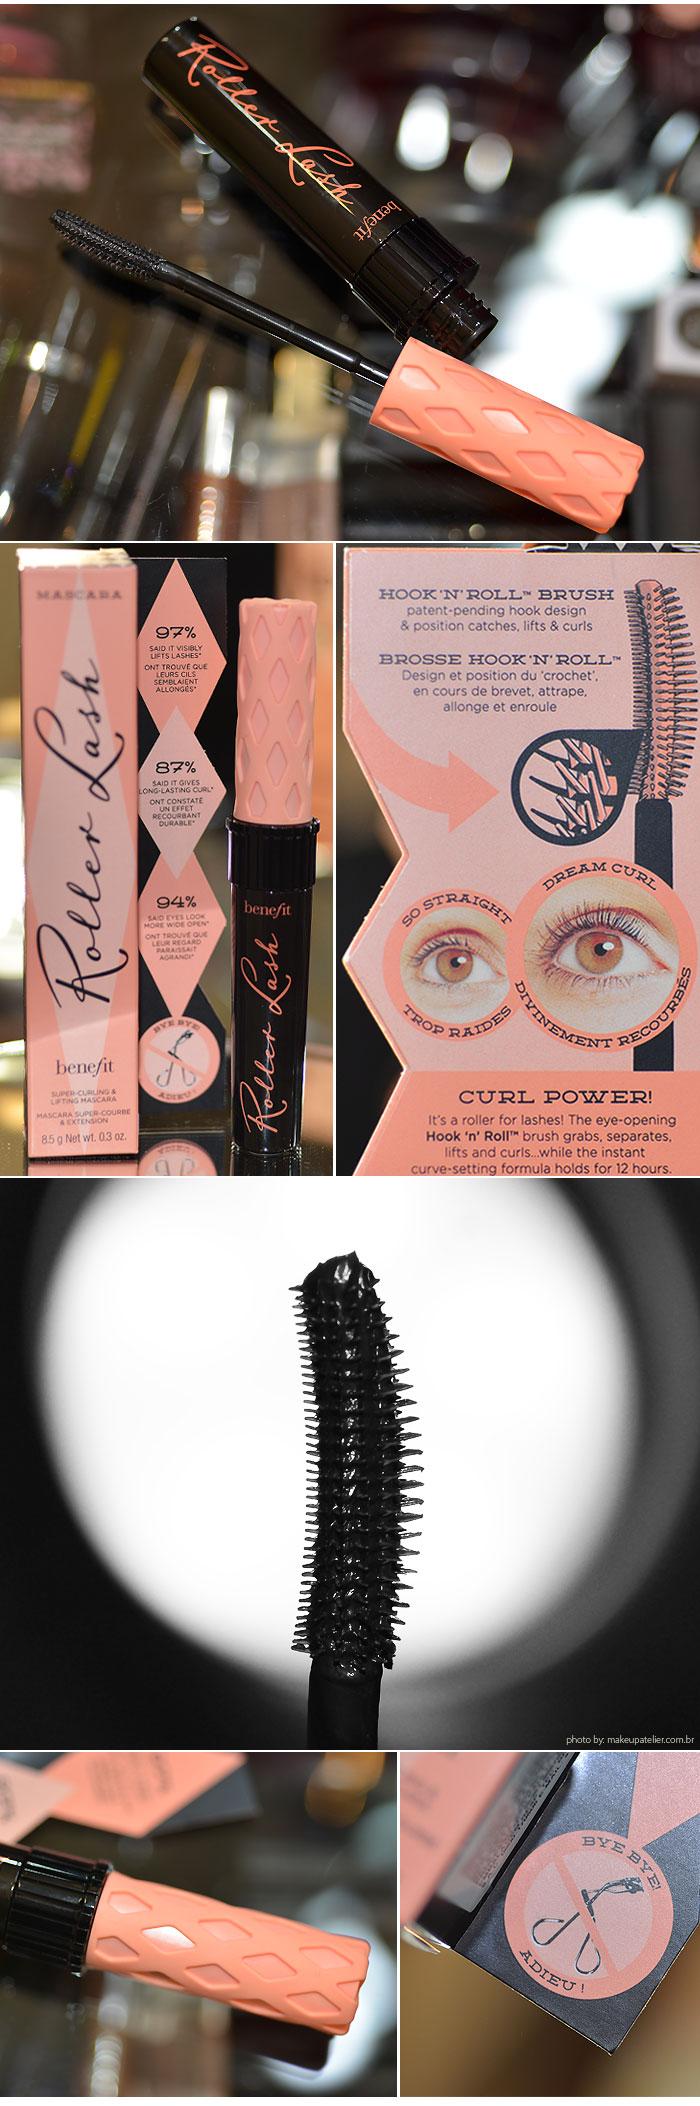 roller_lash_benefit_mascara